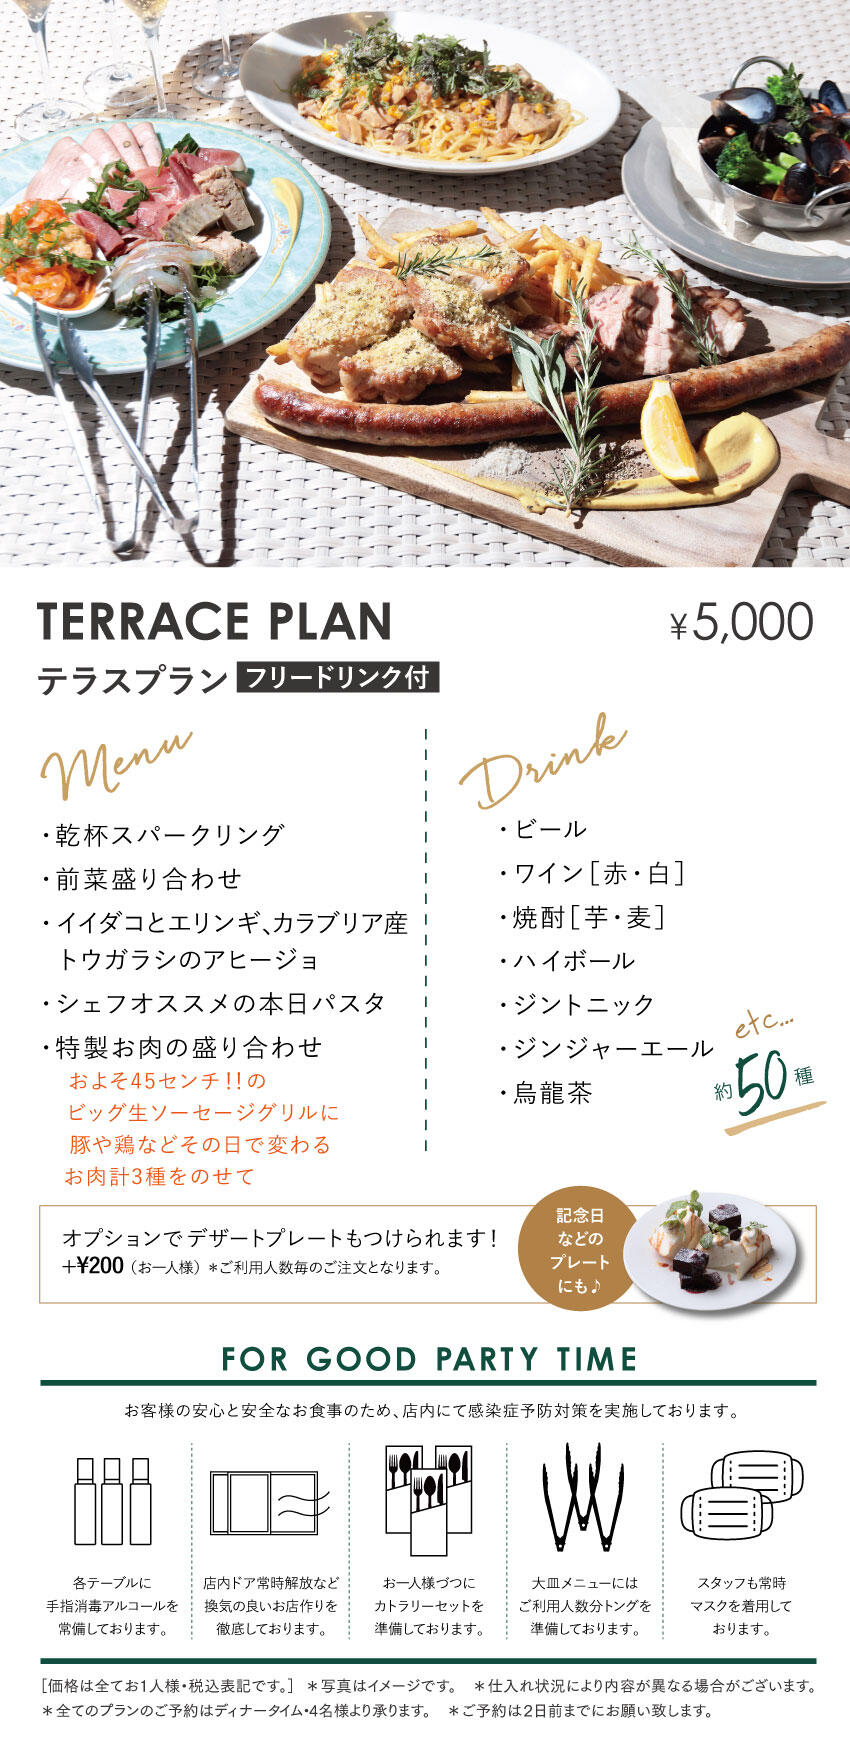 gmck_plan_terrace.jpg